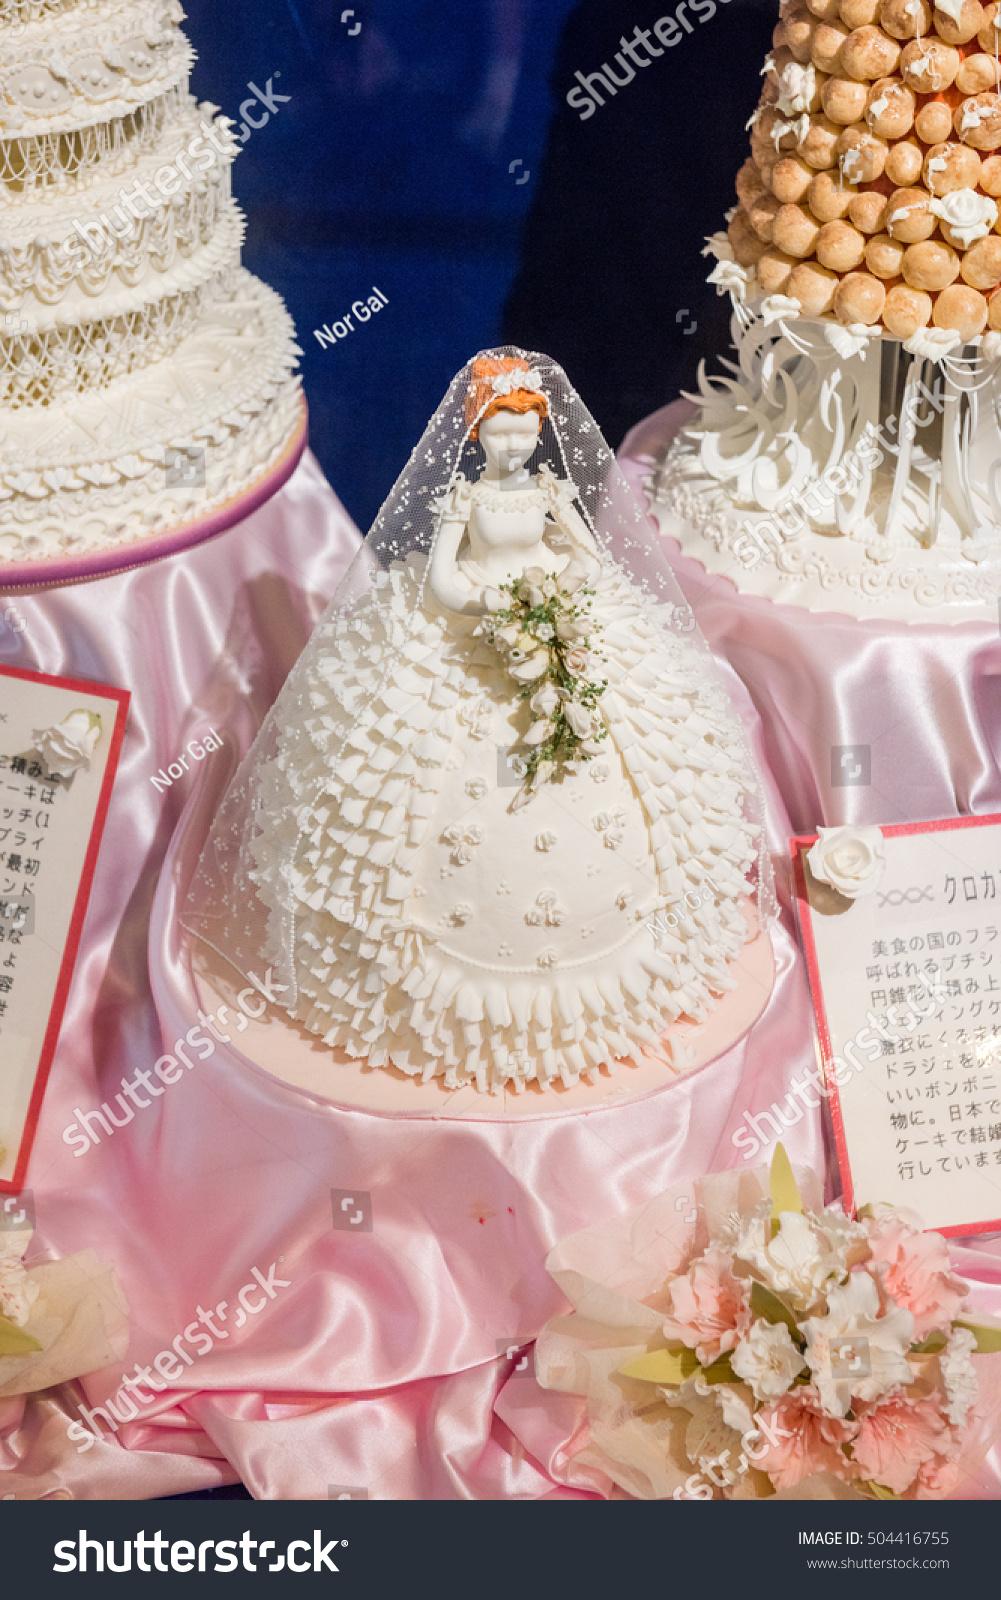 Wedding cake cutting songs 2015